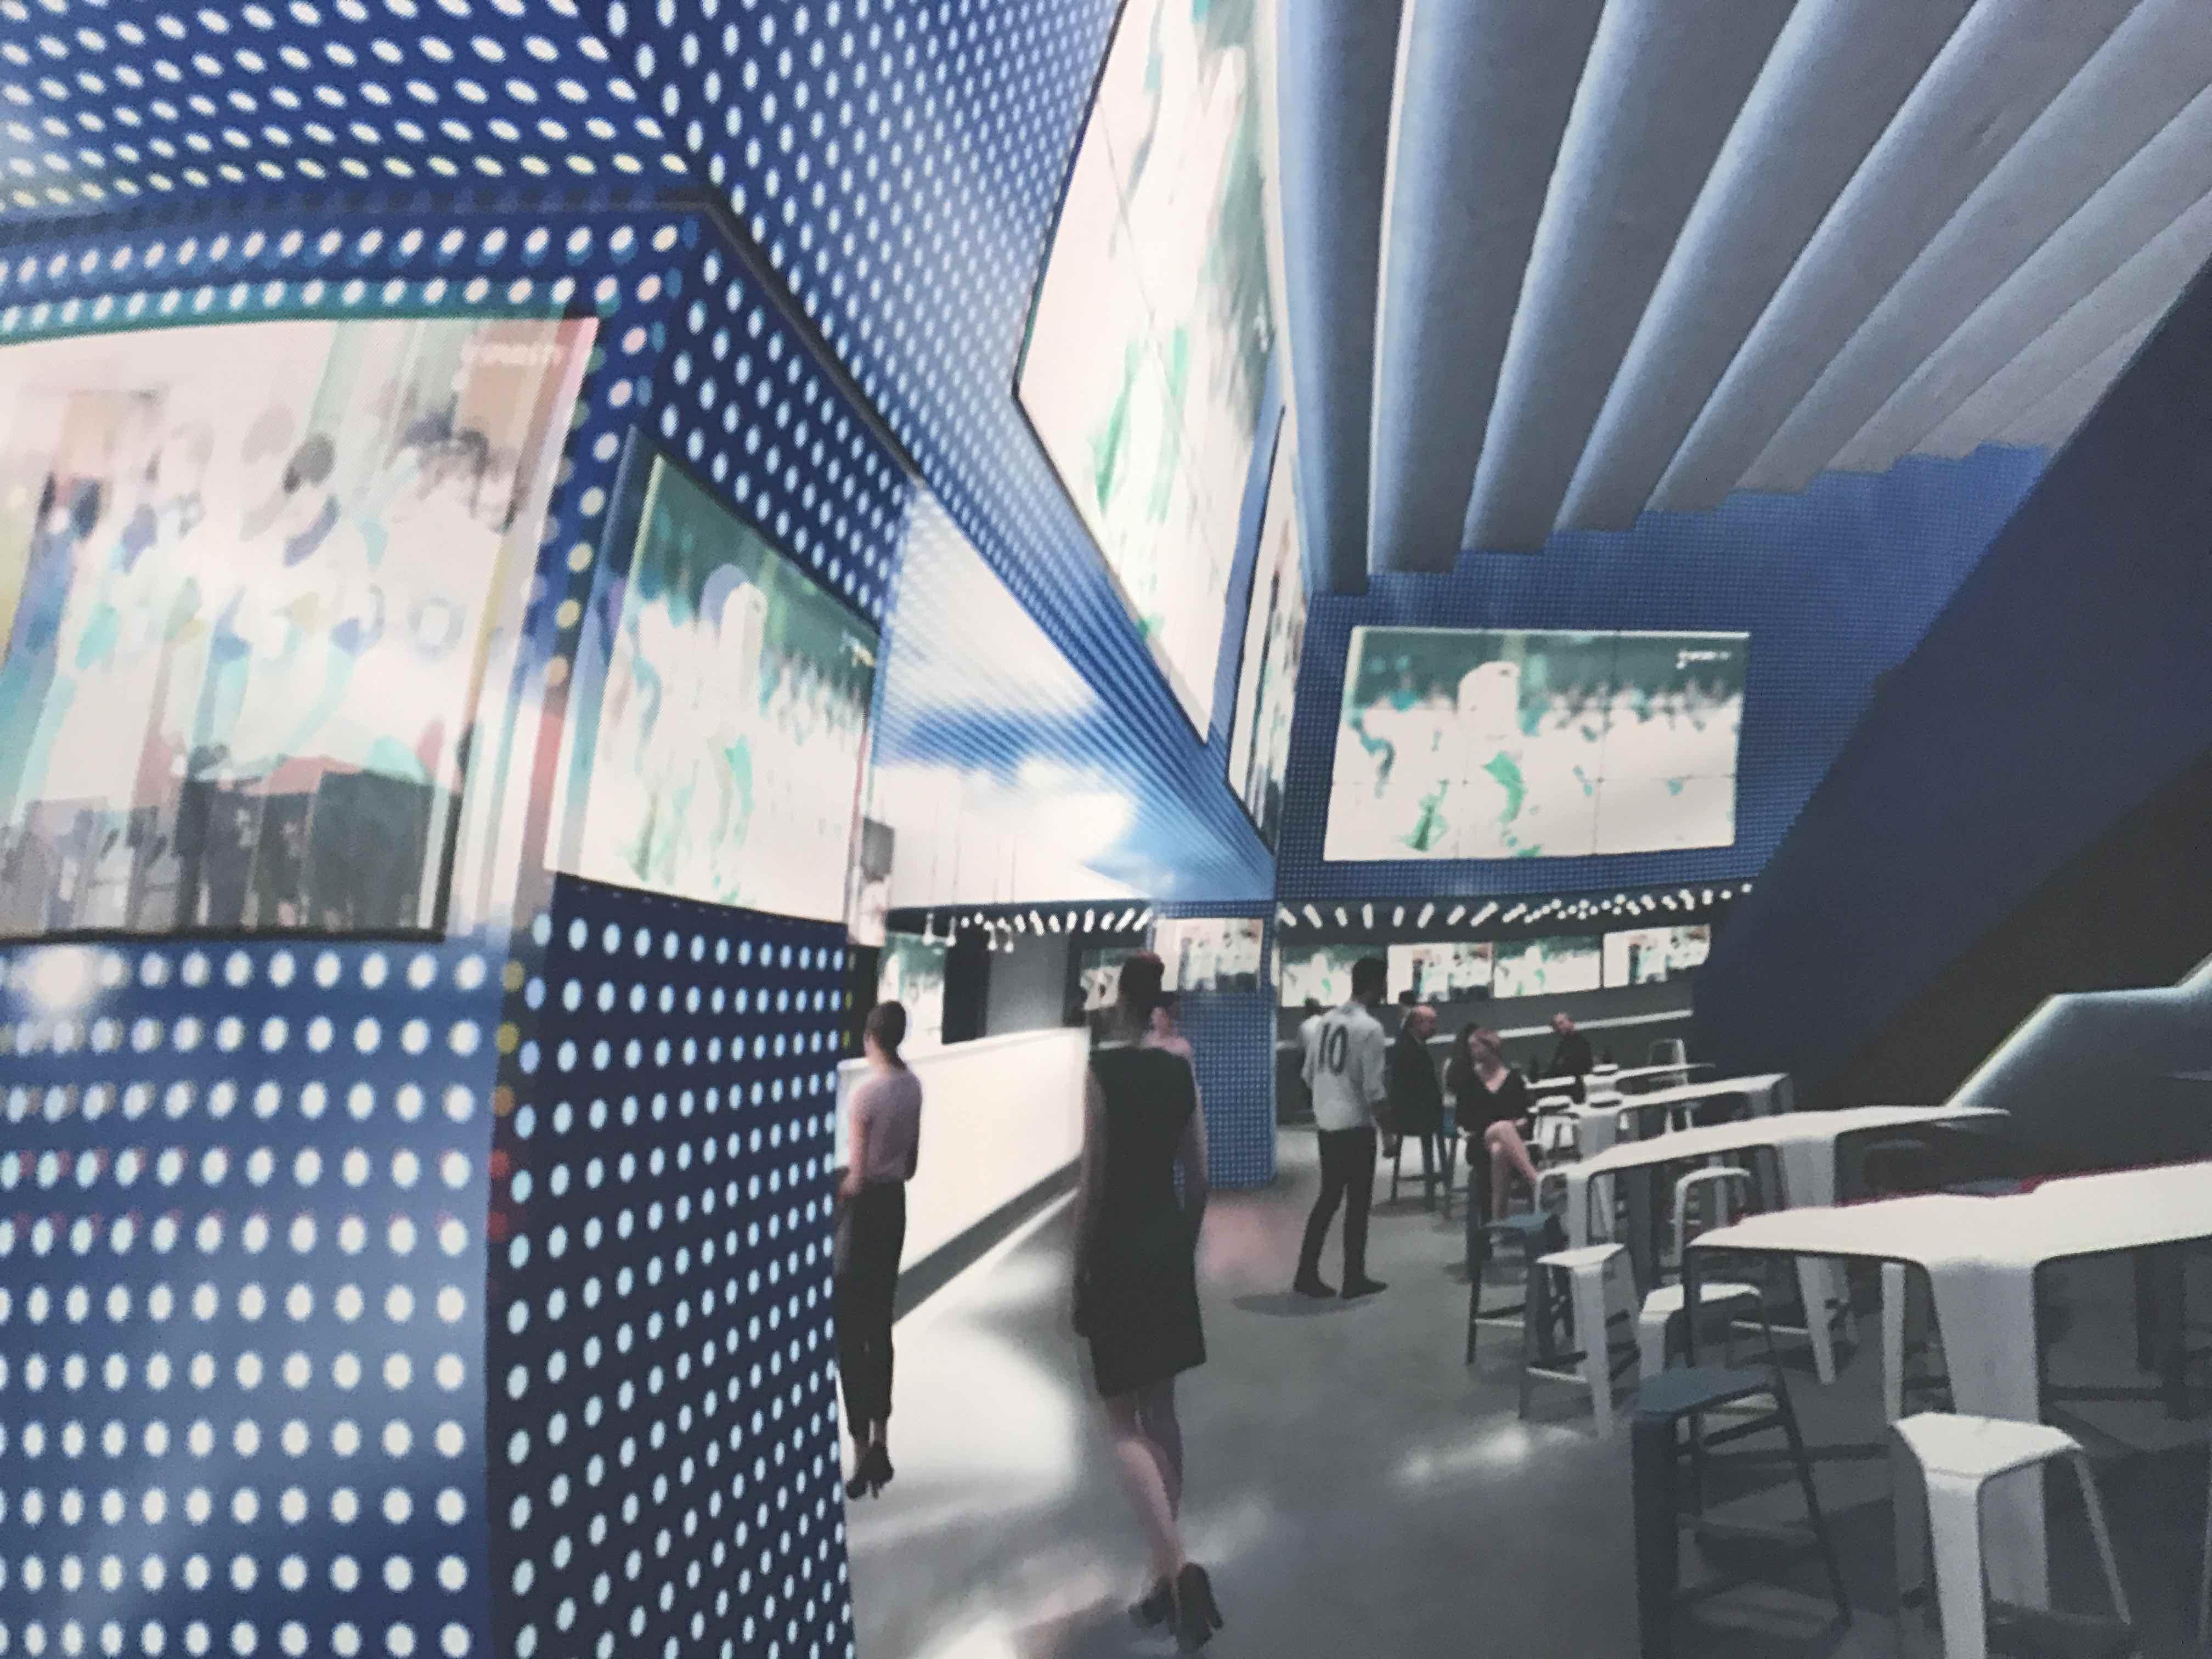 Spurs Launch New Stadium Showcase App Using Vr And Ar Technology Inside World Football